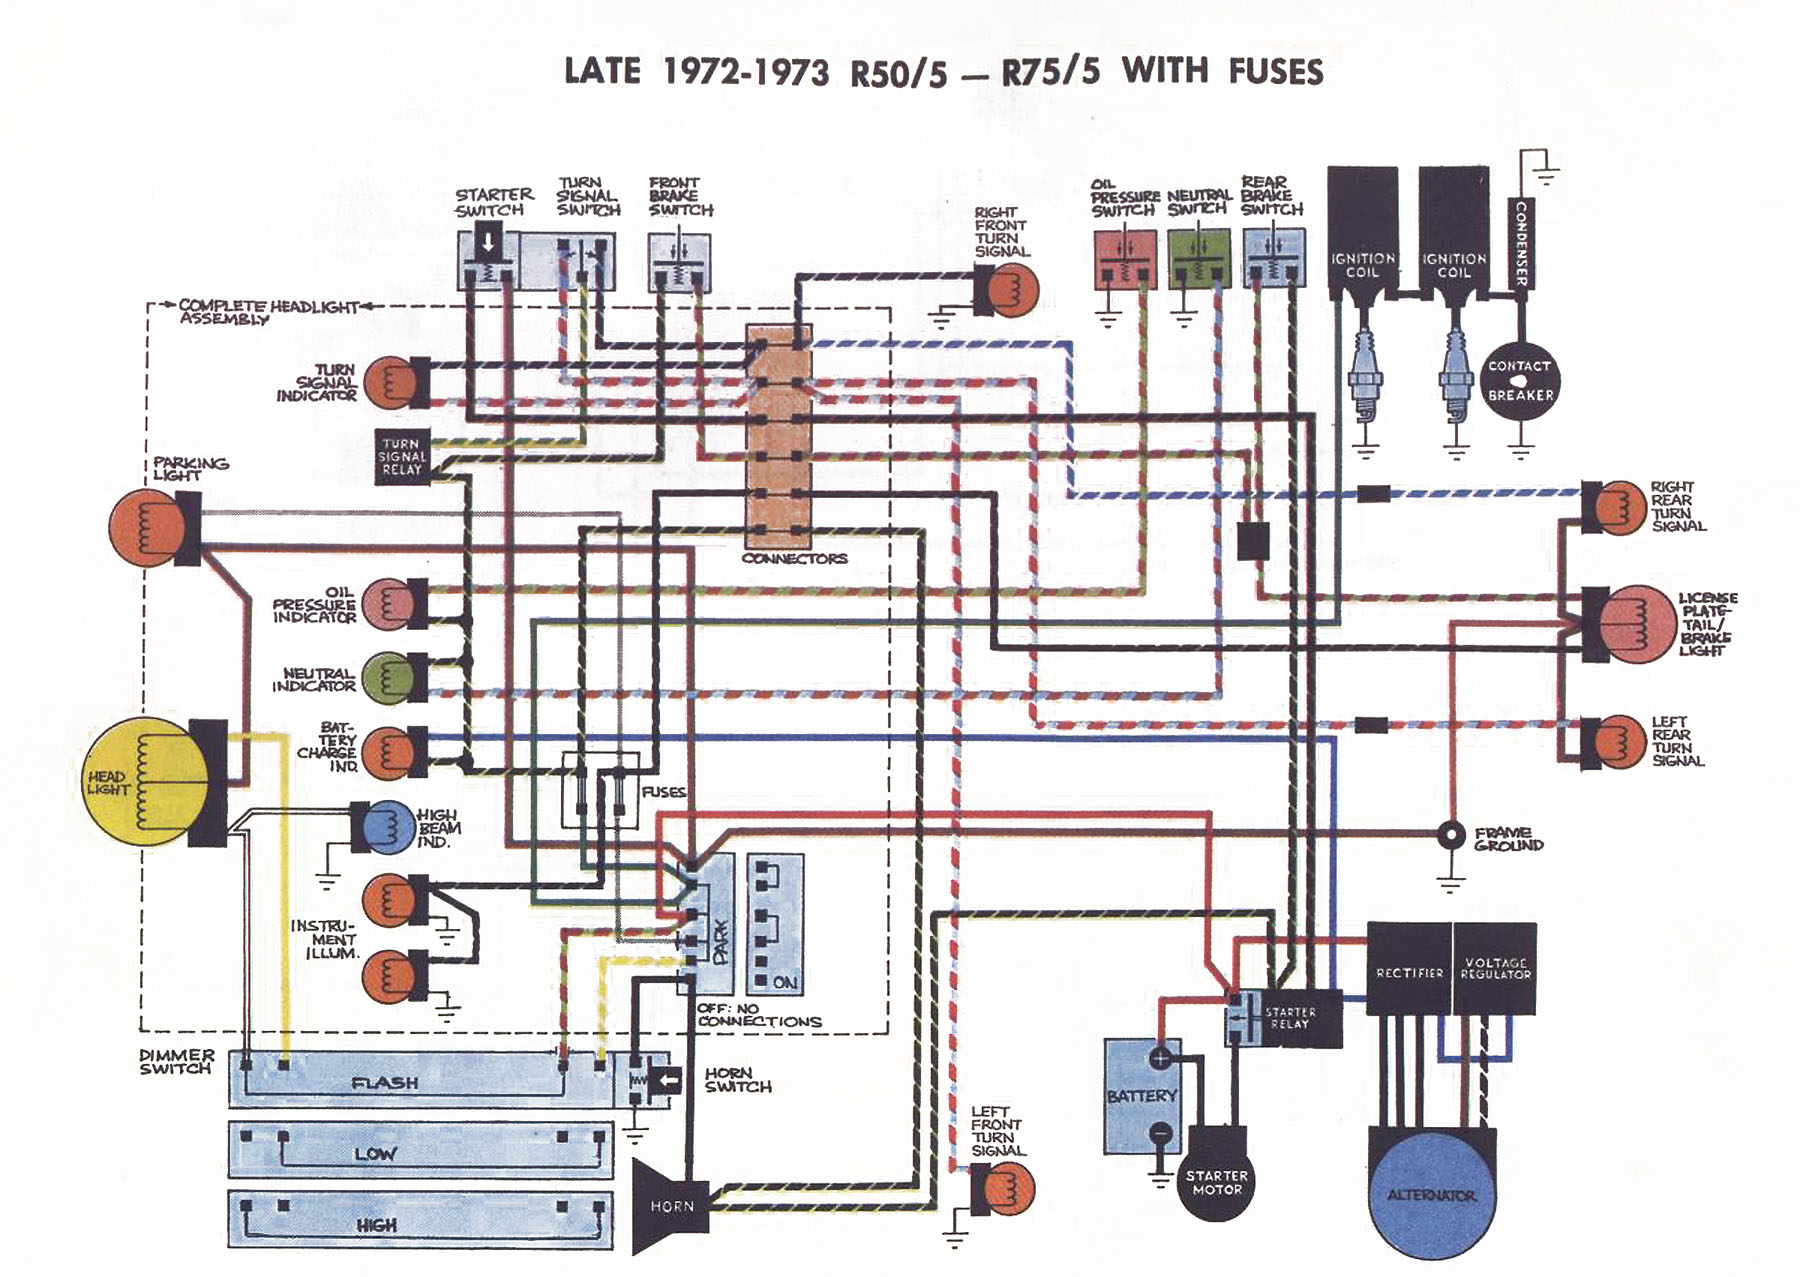 Bmw 118d Wiring Diagram -73 Ford Ranger Wiring Diagram | Begeboy Wiring  Diagram SourceBegeboy Wiring Diagram Source